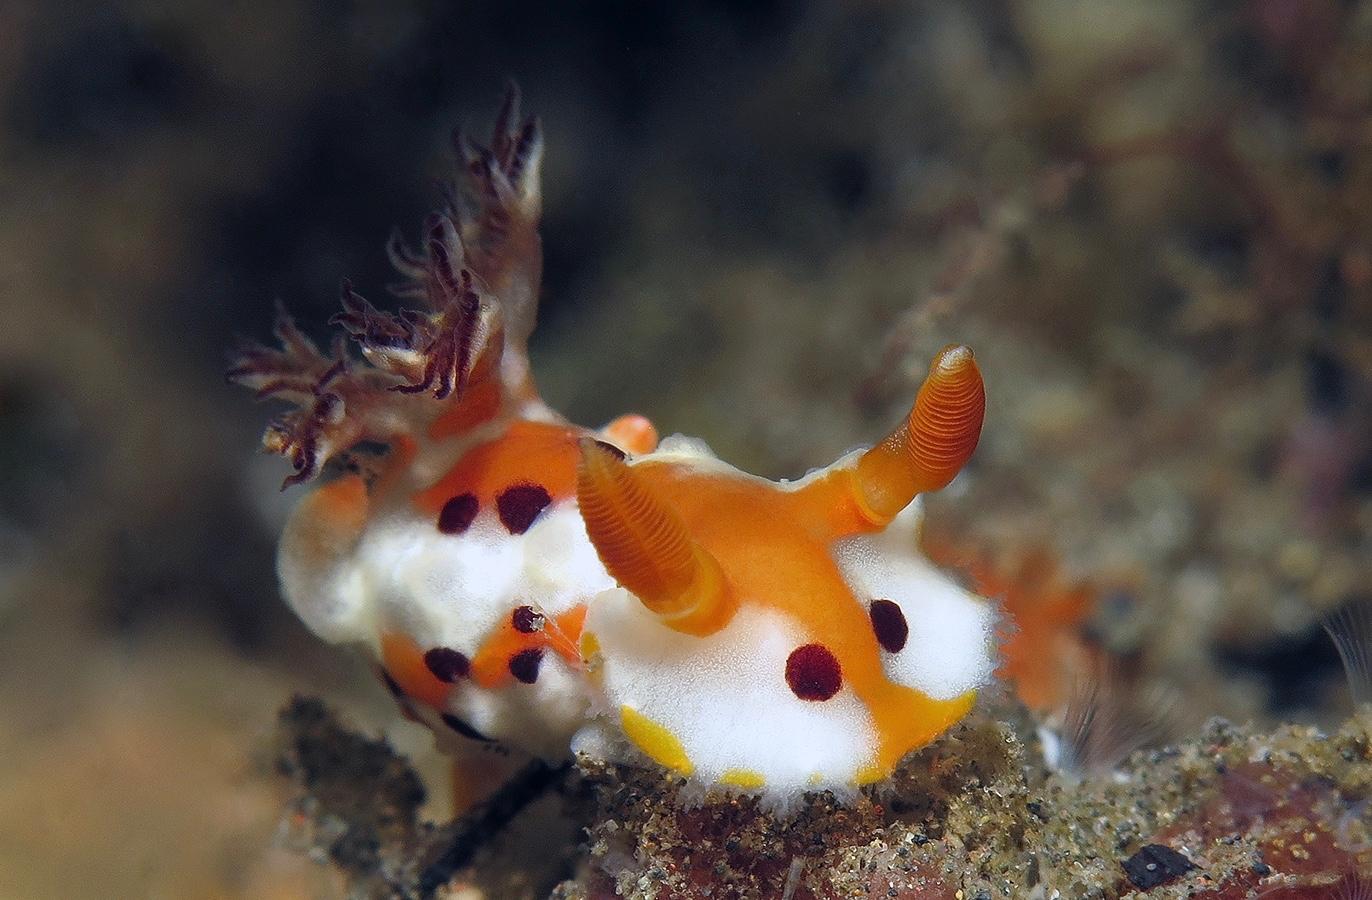 Plocamopherus margaretae   卷毛海蛞蝓  巴厘岛艾湄湾 Amed Bay 印度尼西亚 Indonesia @lazydiving.com 潜水时光